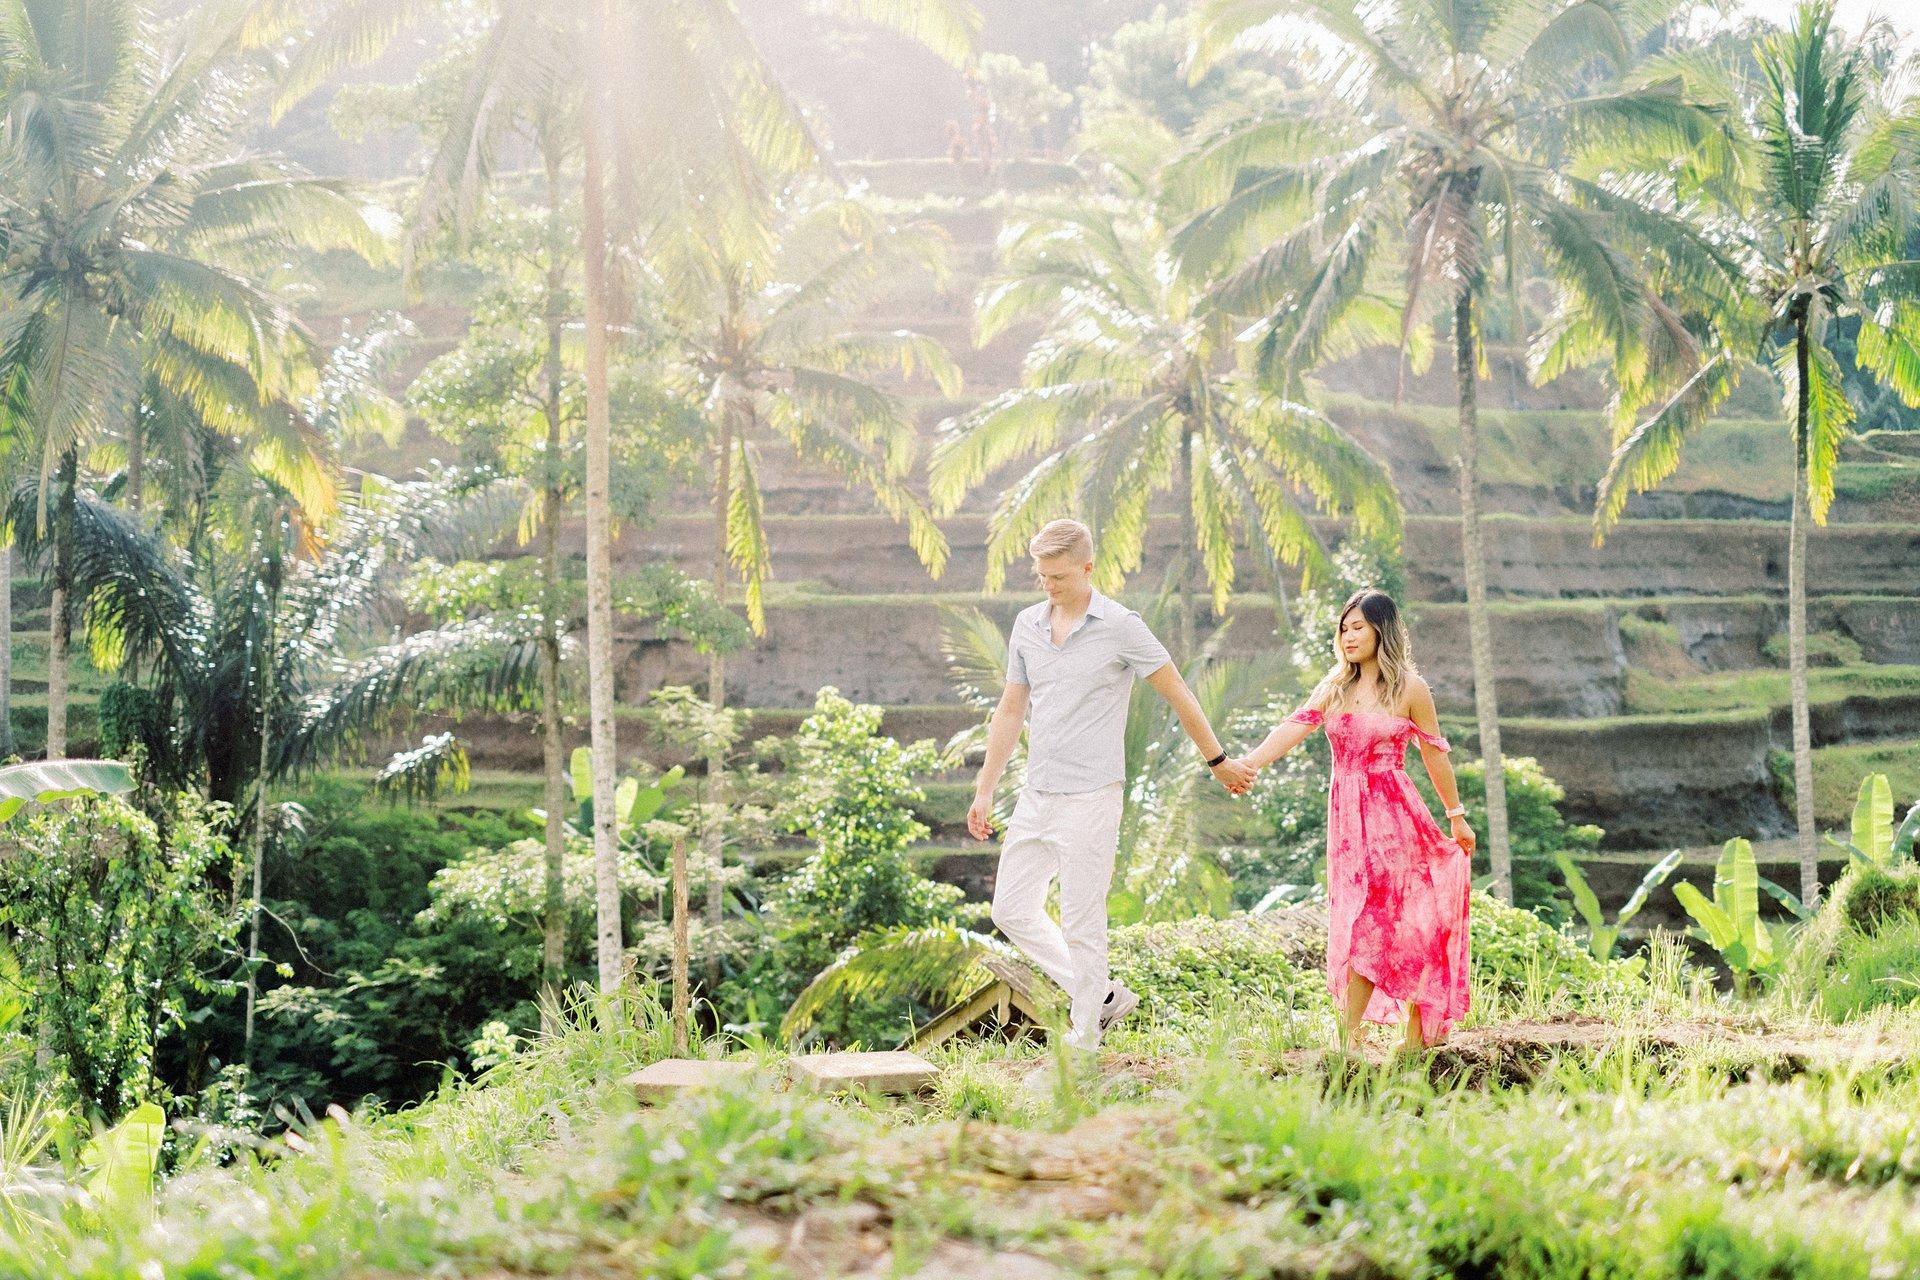 Flytographer Travel Story - Our Honeymoon in Bali